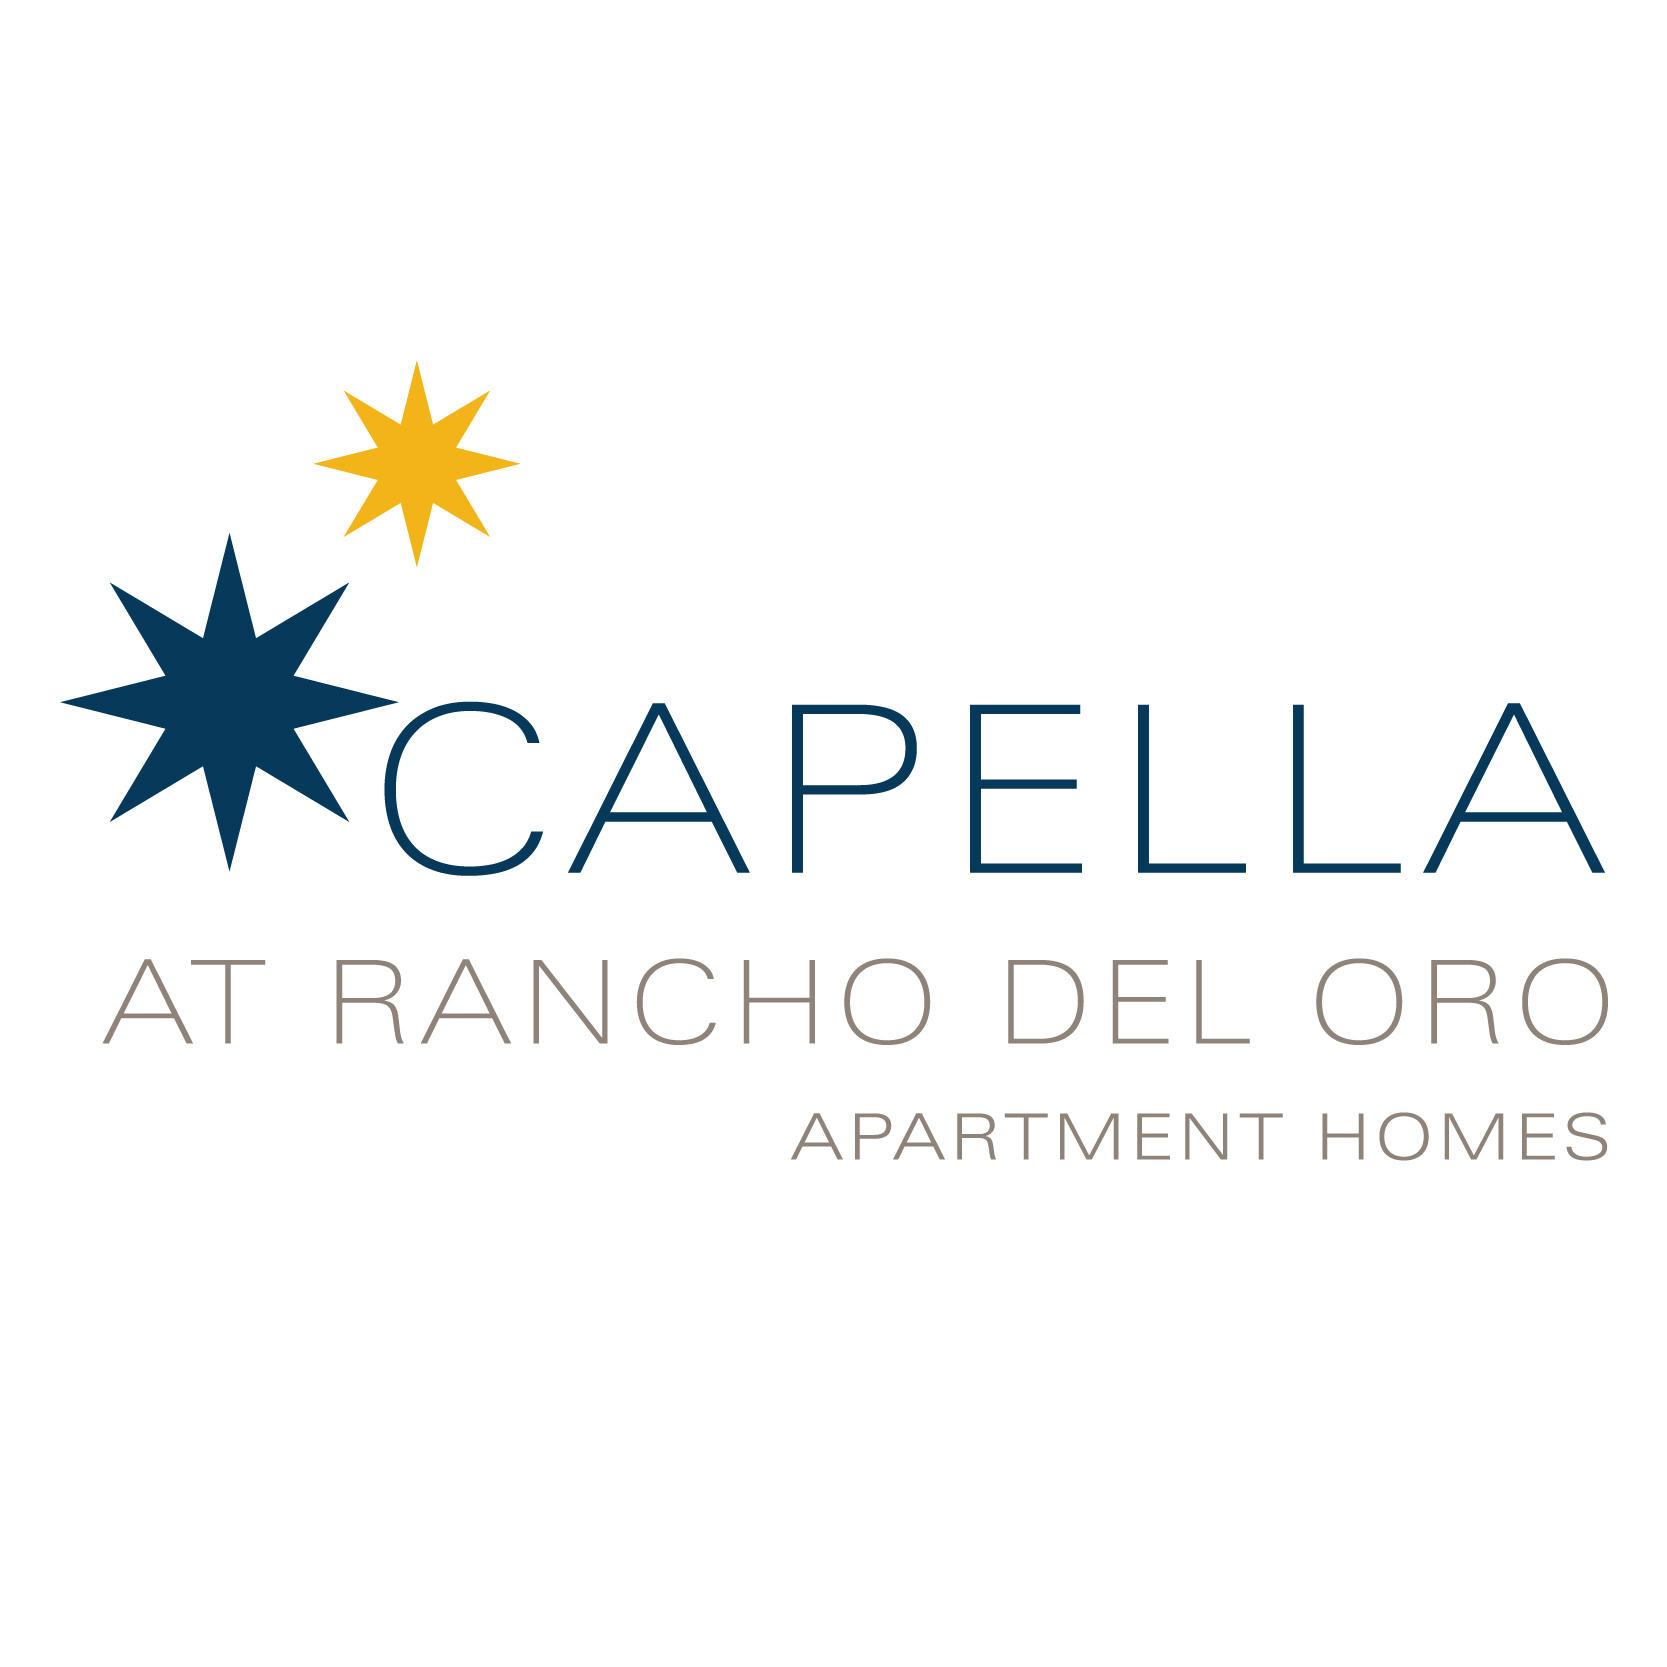 Capella at Rancho Del Oro Luxury Apartment Homes image 19